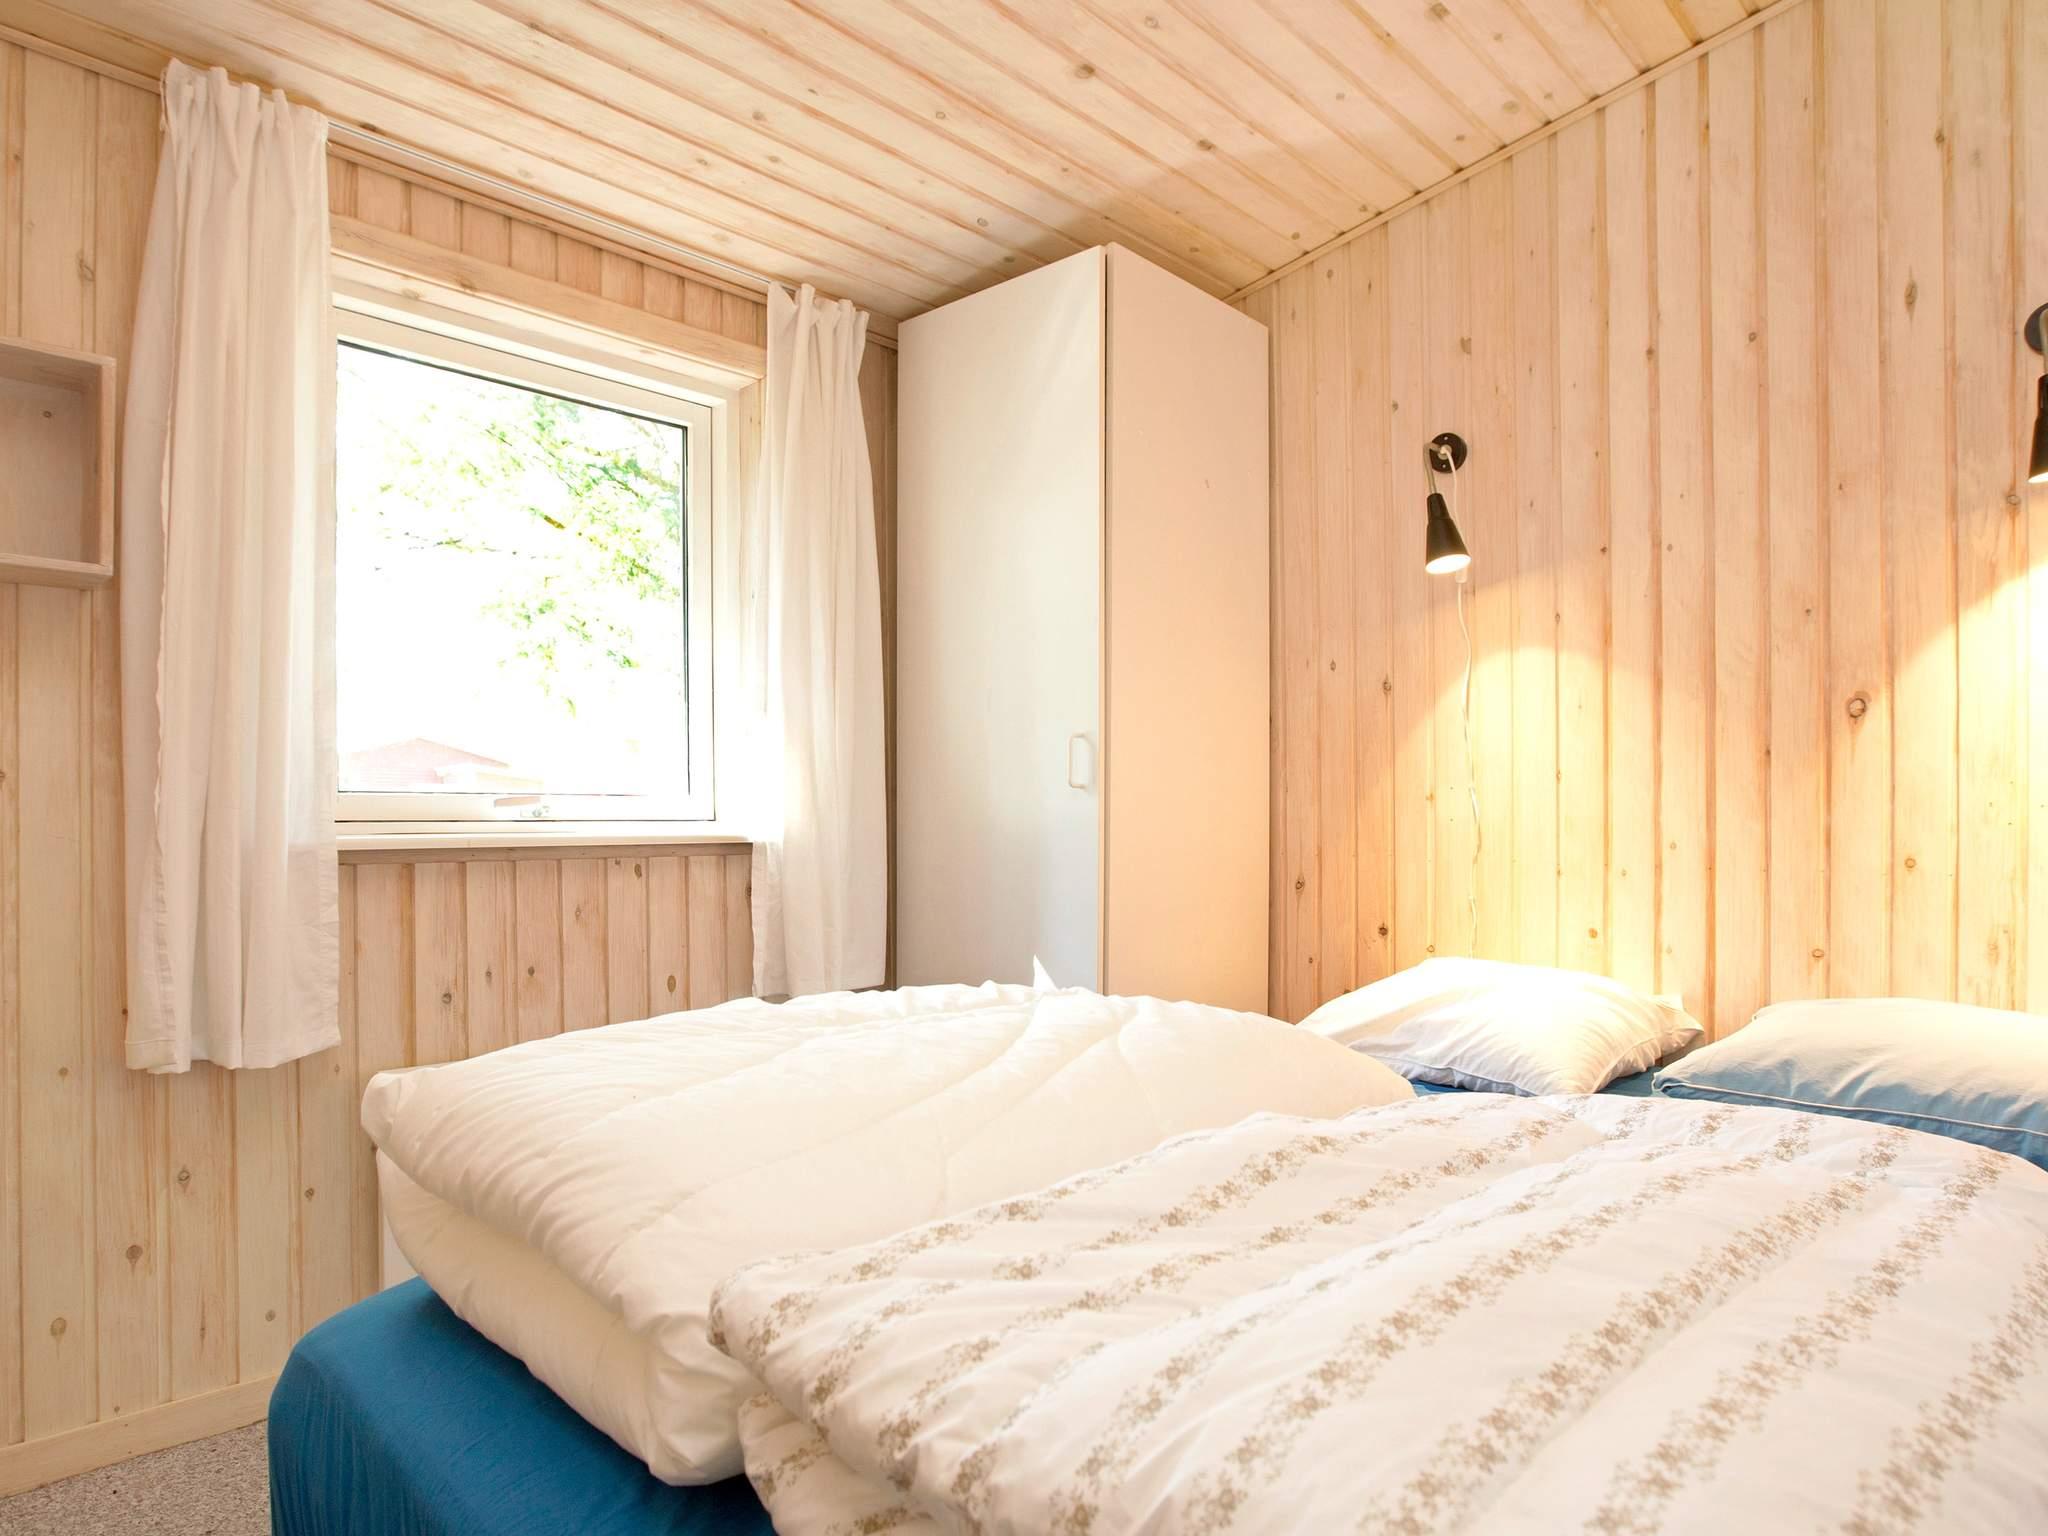 Maison de vacances Kramnitze (87262), Kramnitse, , Lolland, Danemark, image 15